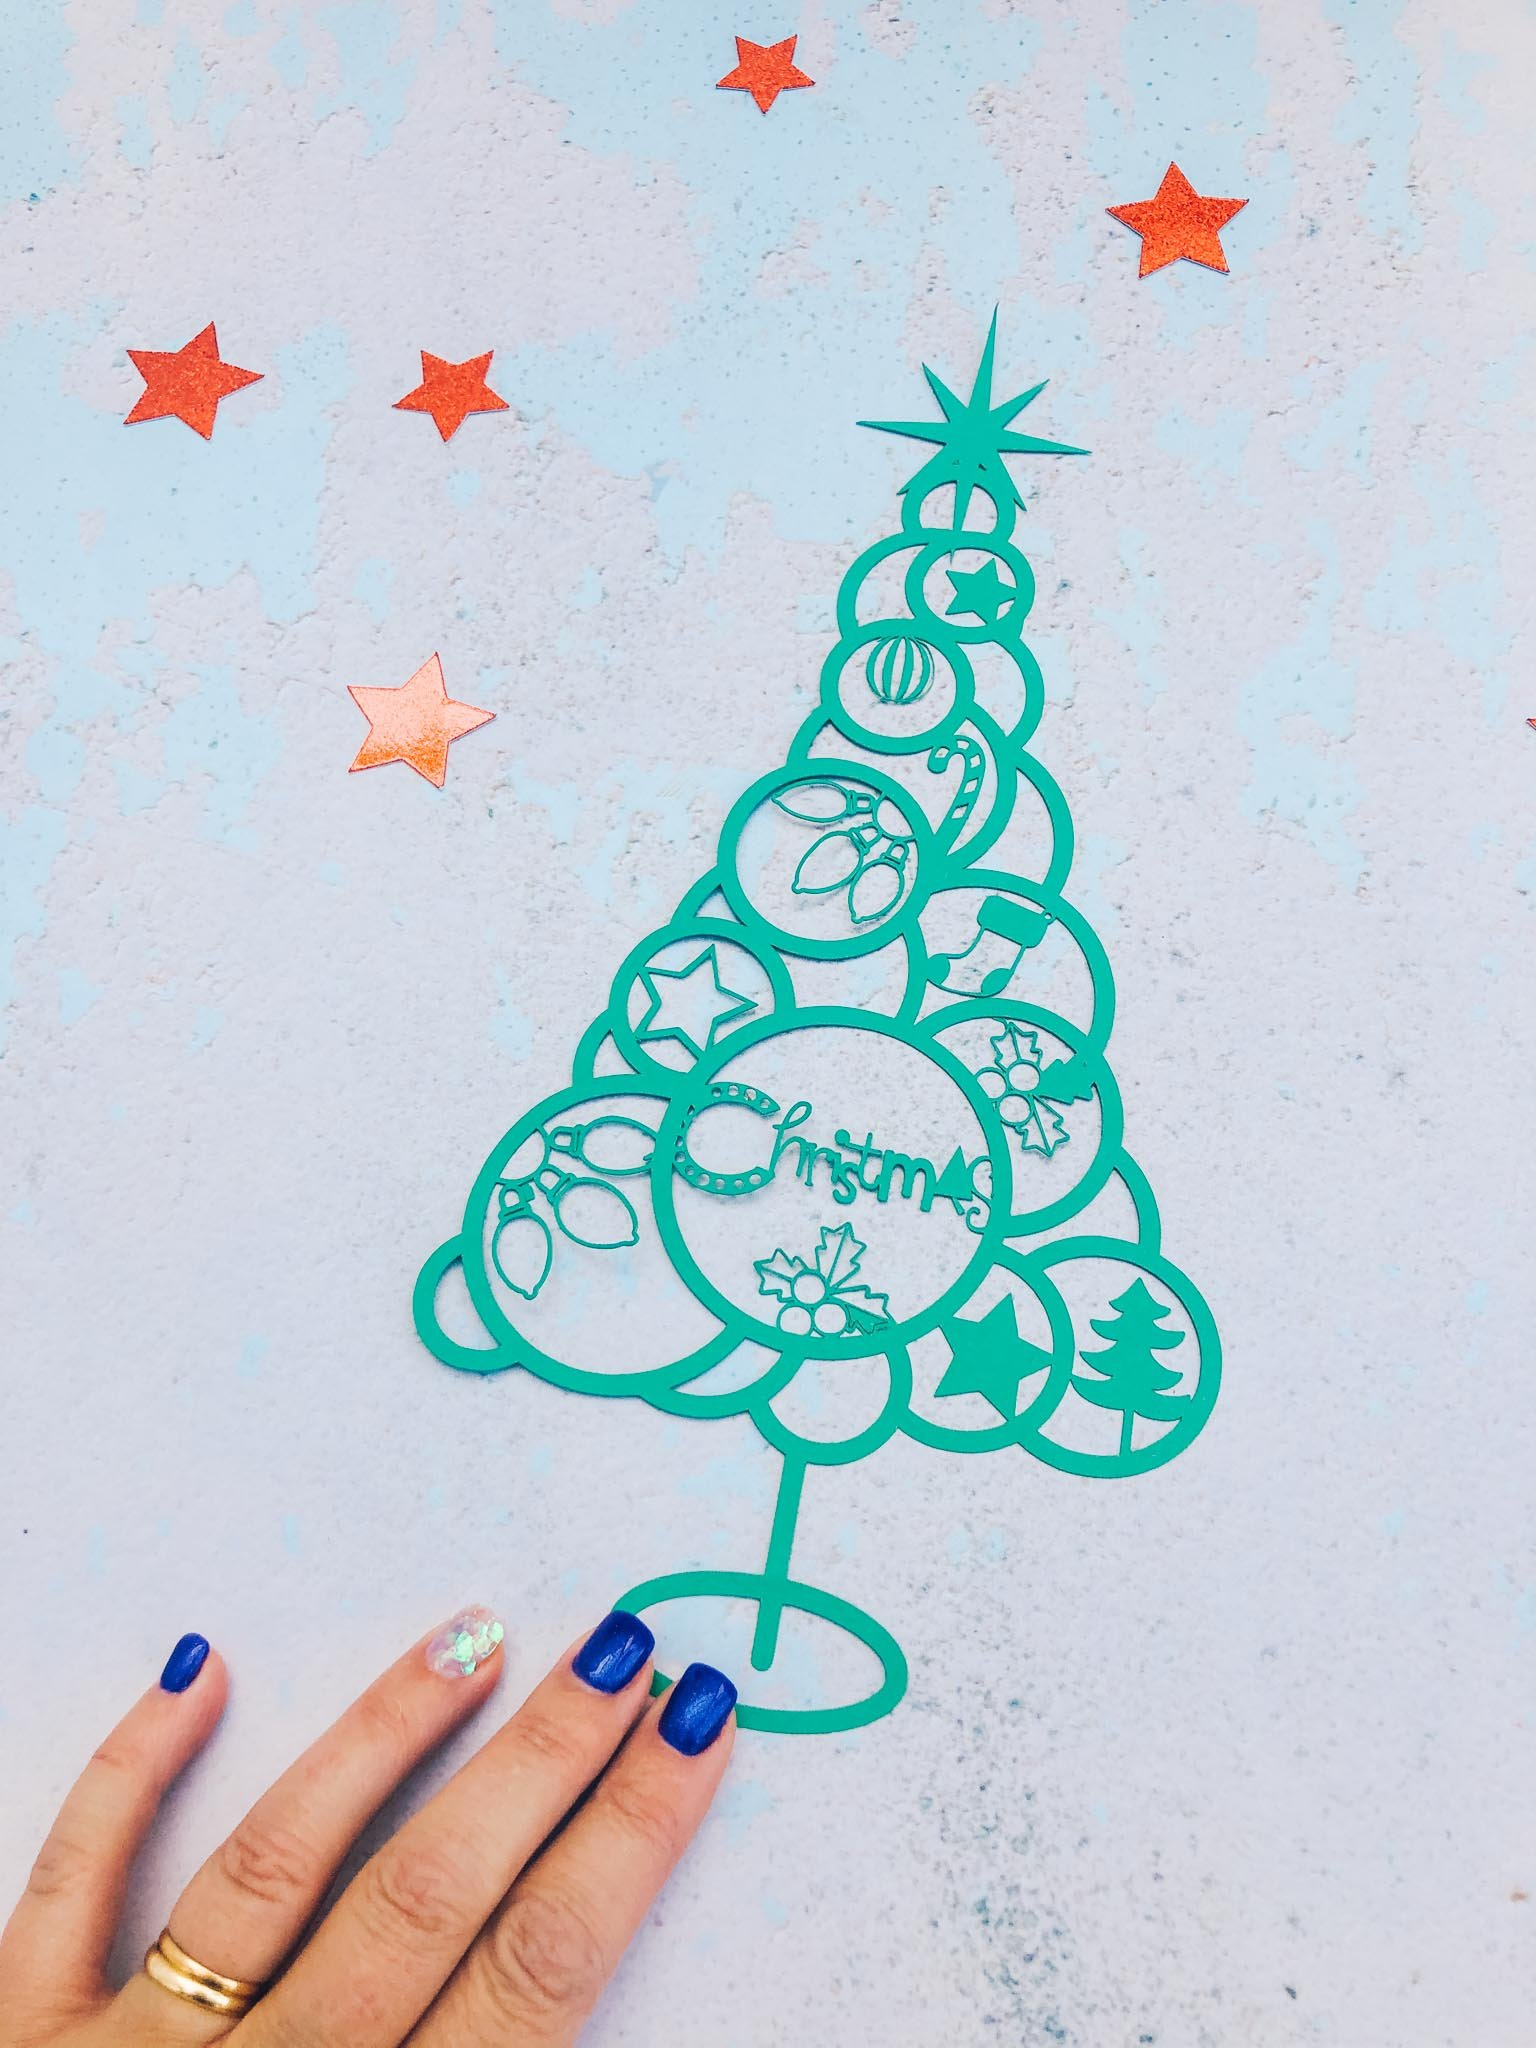 Cricut Christmas tree SVG png file